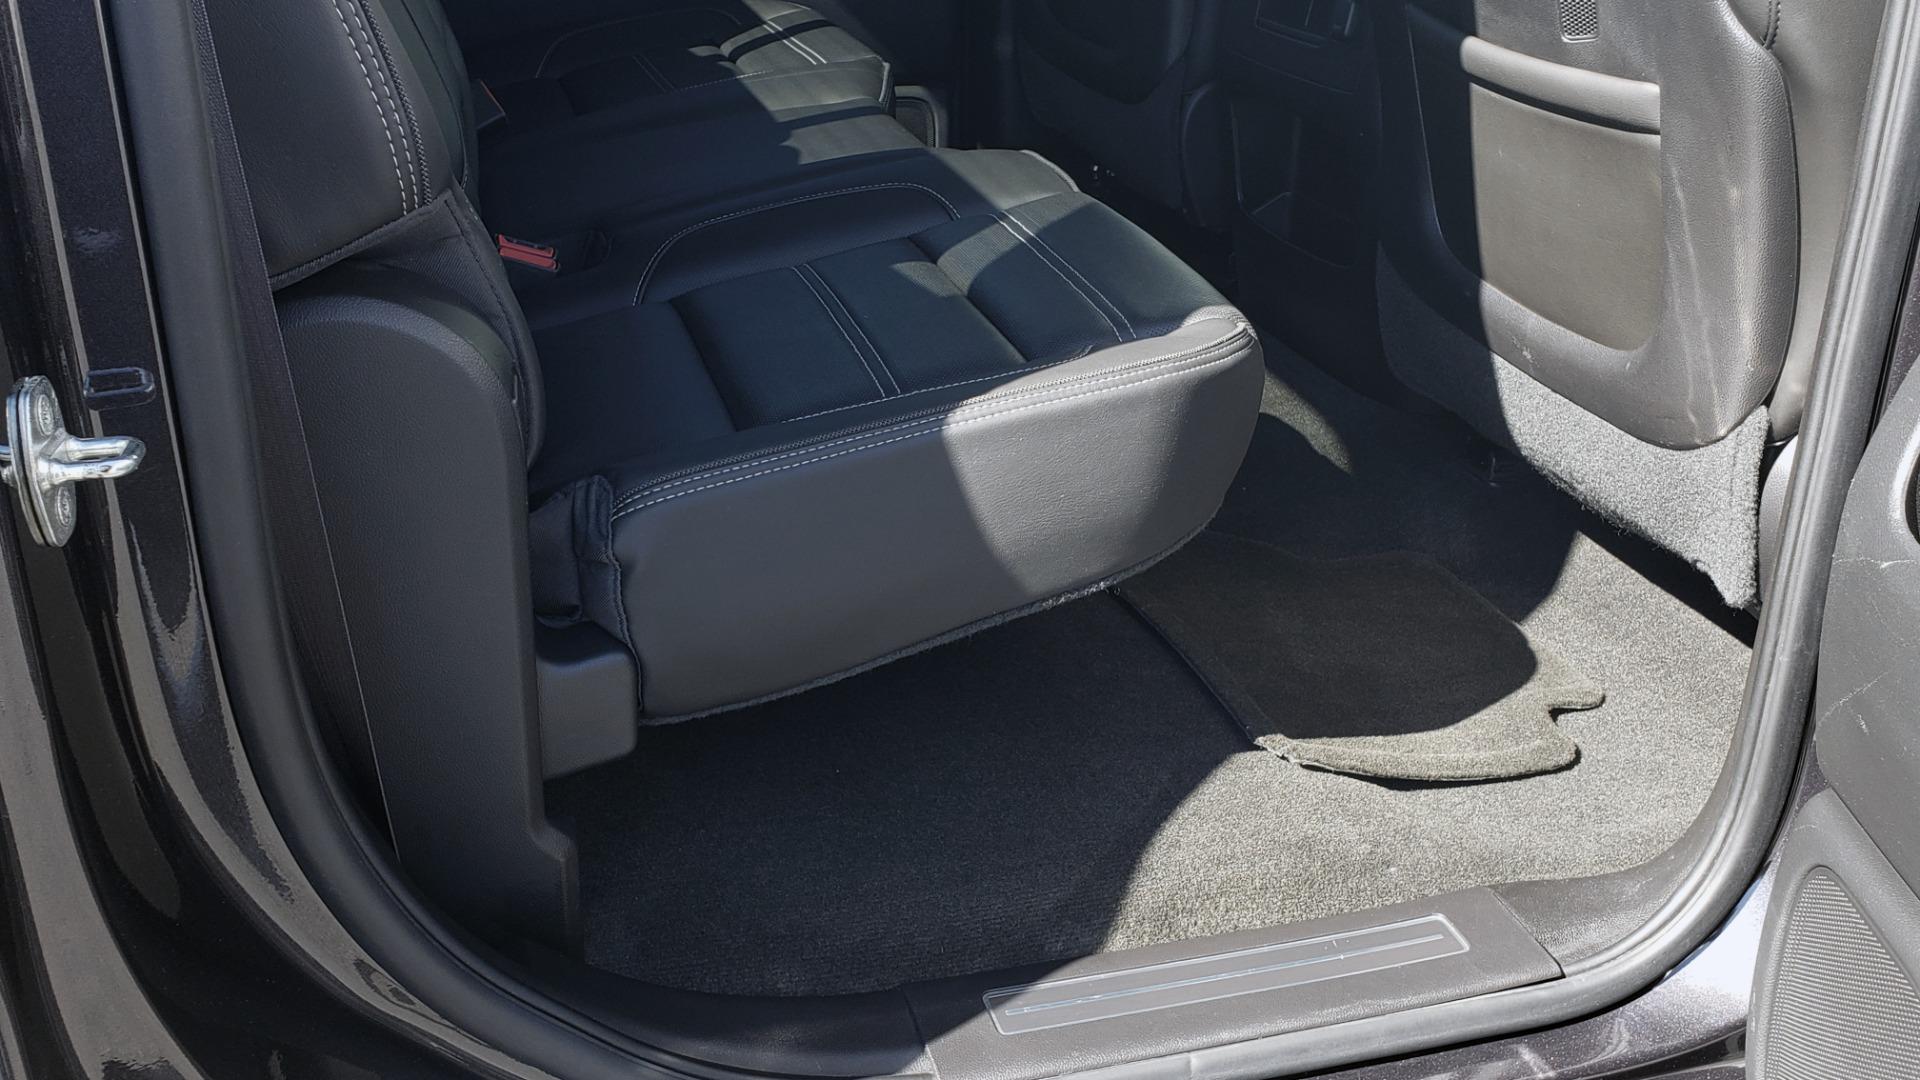 Used 2015 GMC SIERRA 2500HD DENALI 4WD CREWCAB / 6.6L DURAMAX / 6-SPD AUTO / NAV / BOSE for sale $50,995 at Formula Imports in Charlotte NC 28227 81